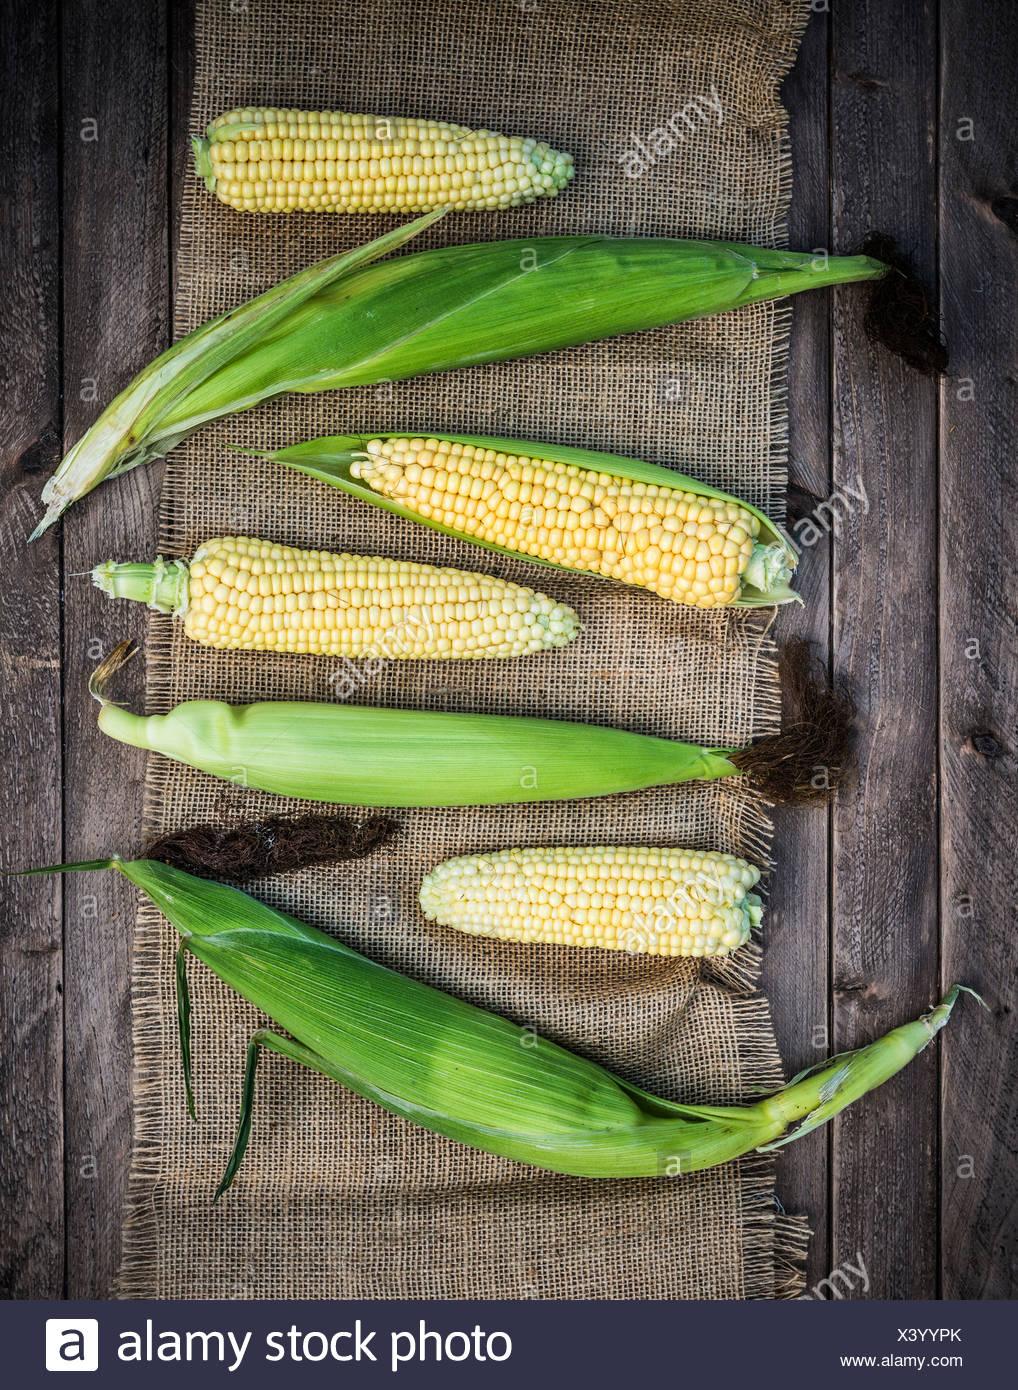 Freshly picked corn on the cob. - Stock Image